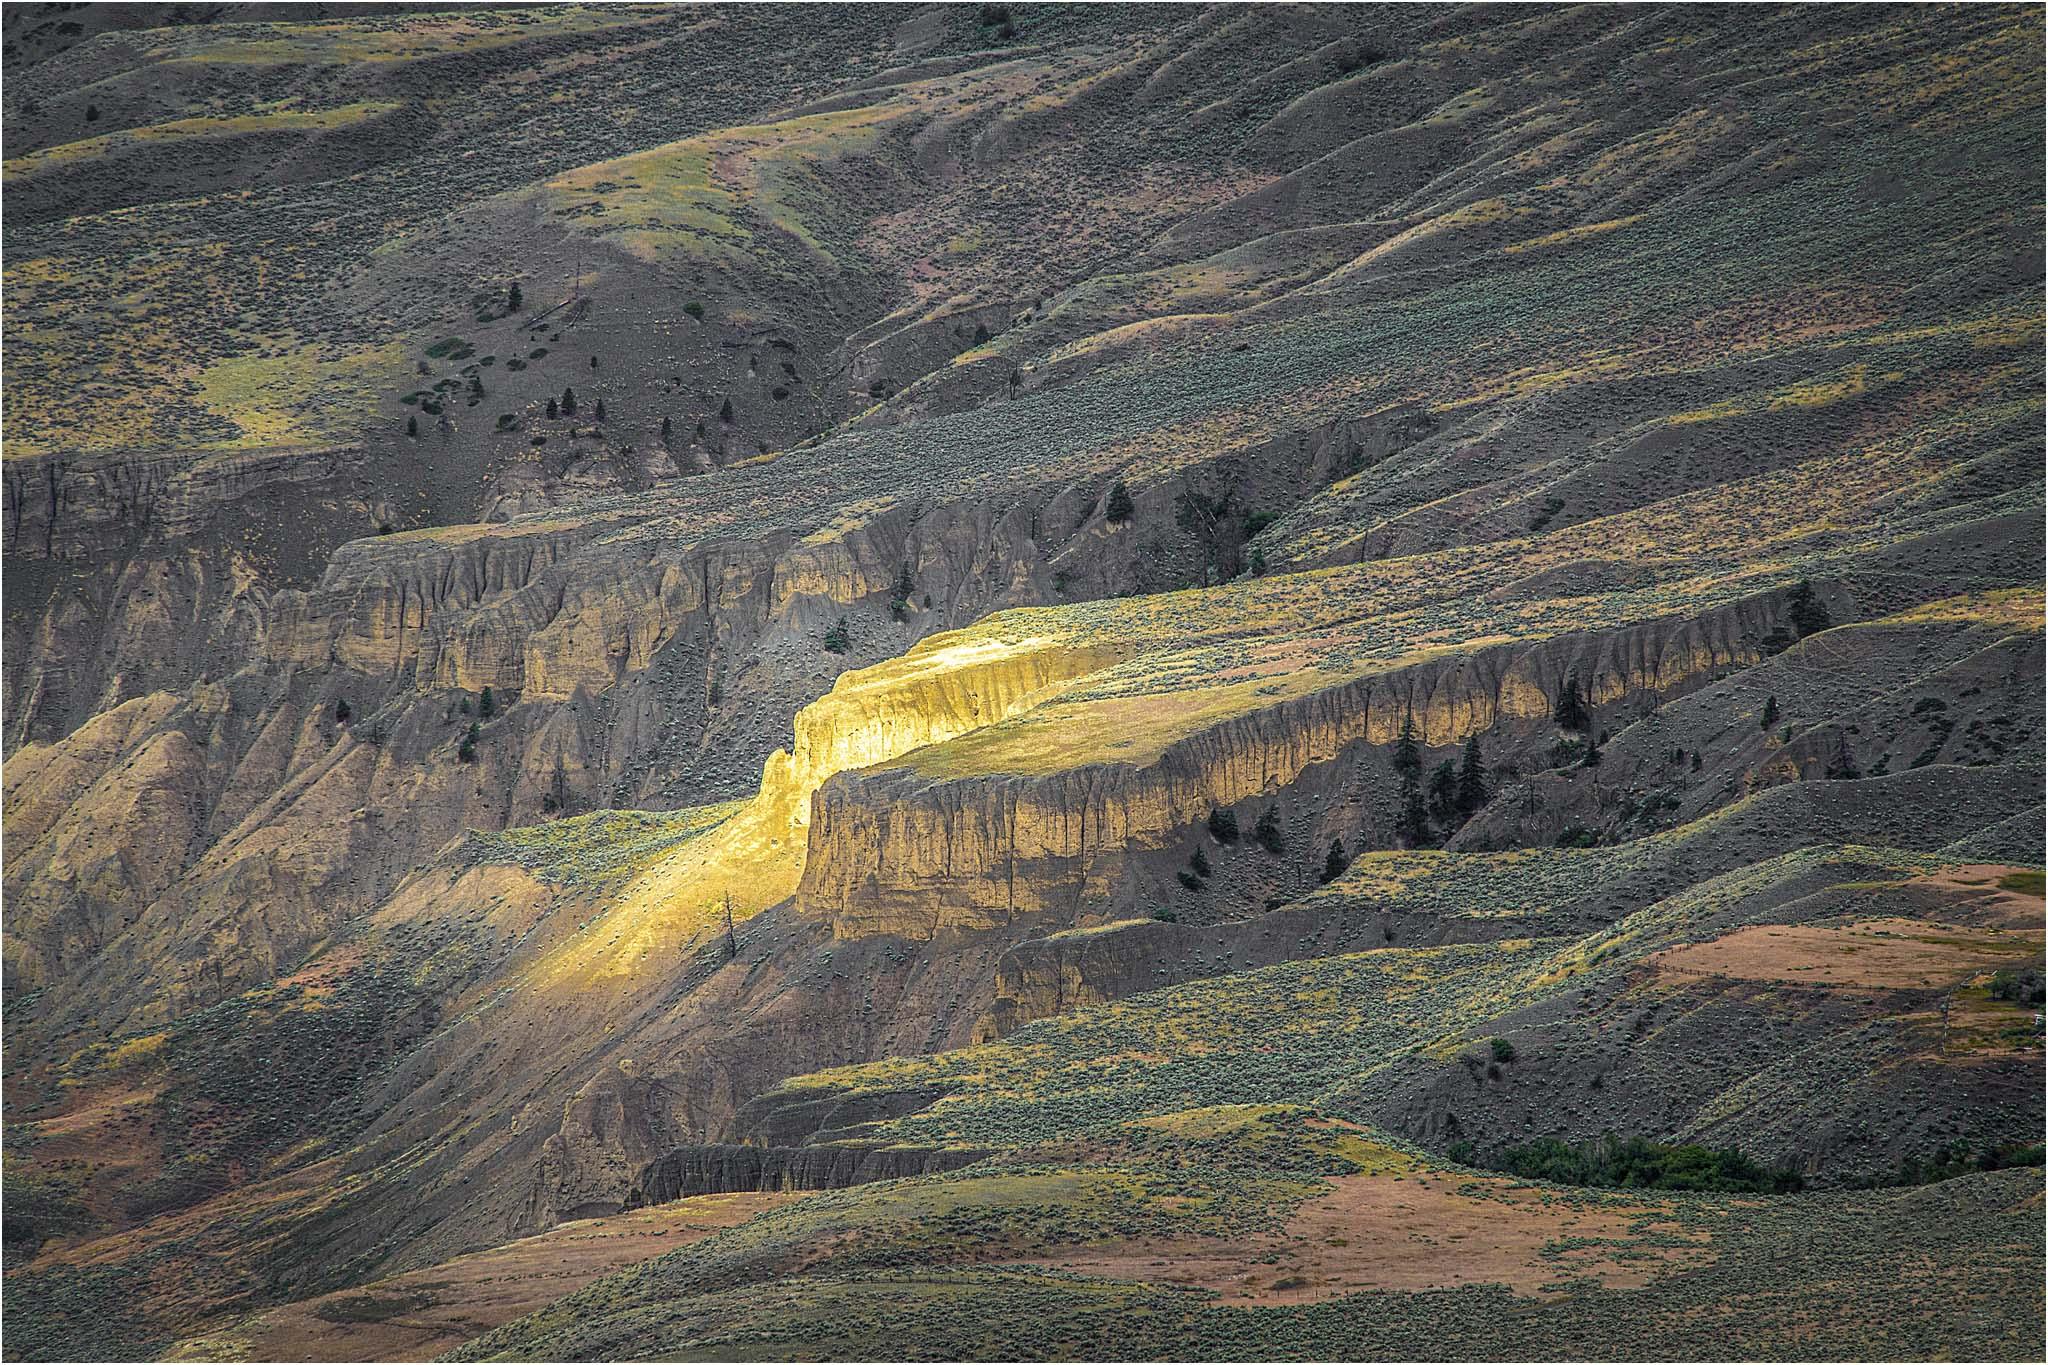 The Pot of Gold - Cougar Pt © Larry Citra